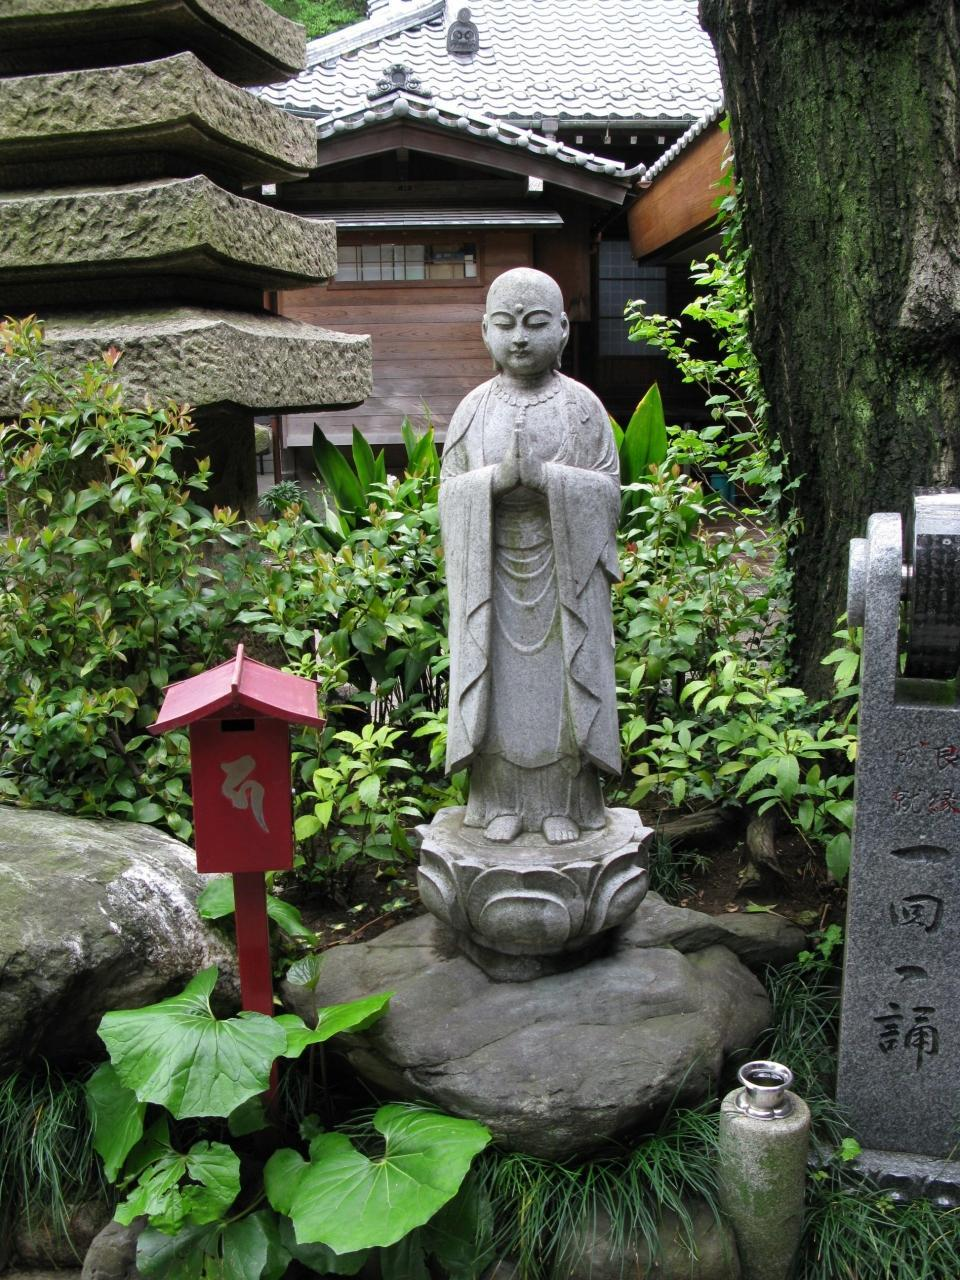 【10位】大円寺 / 目黒